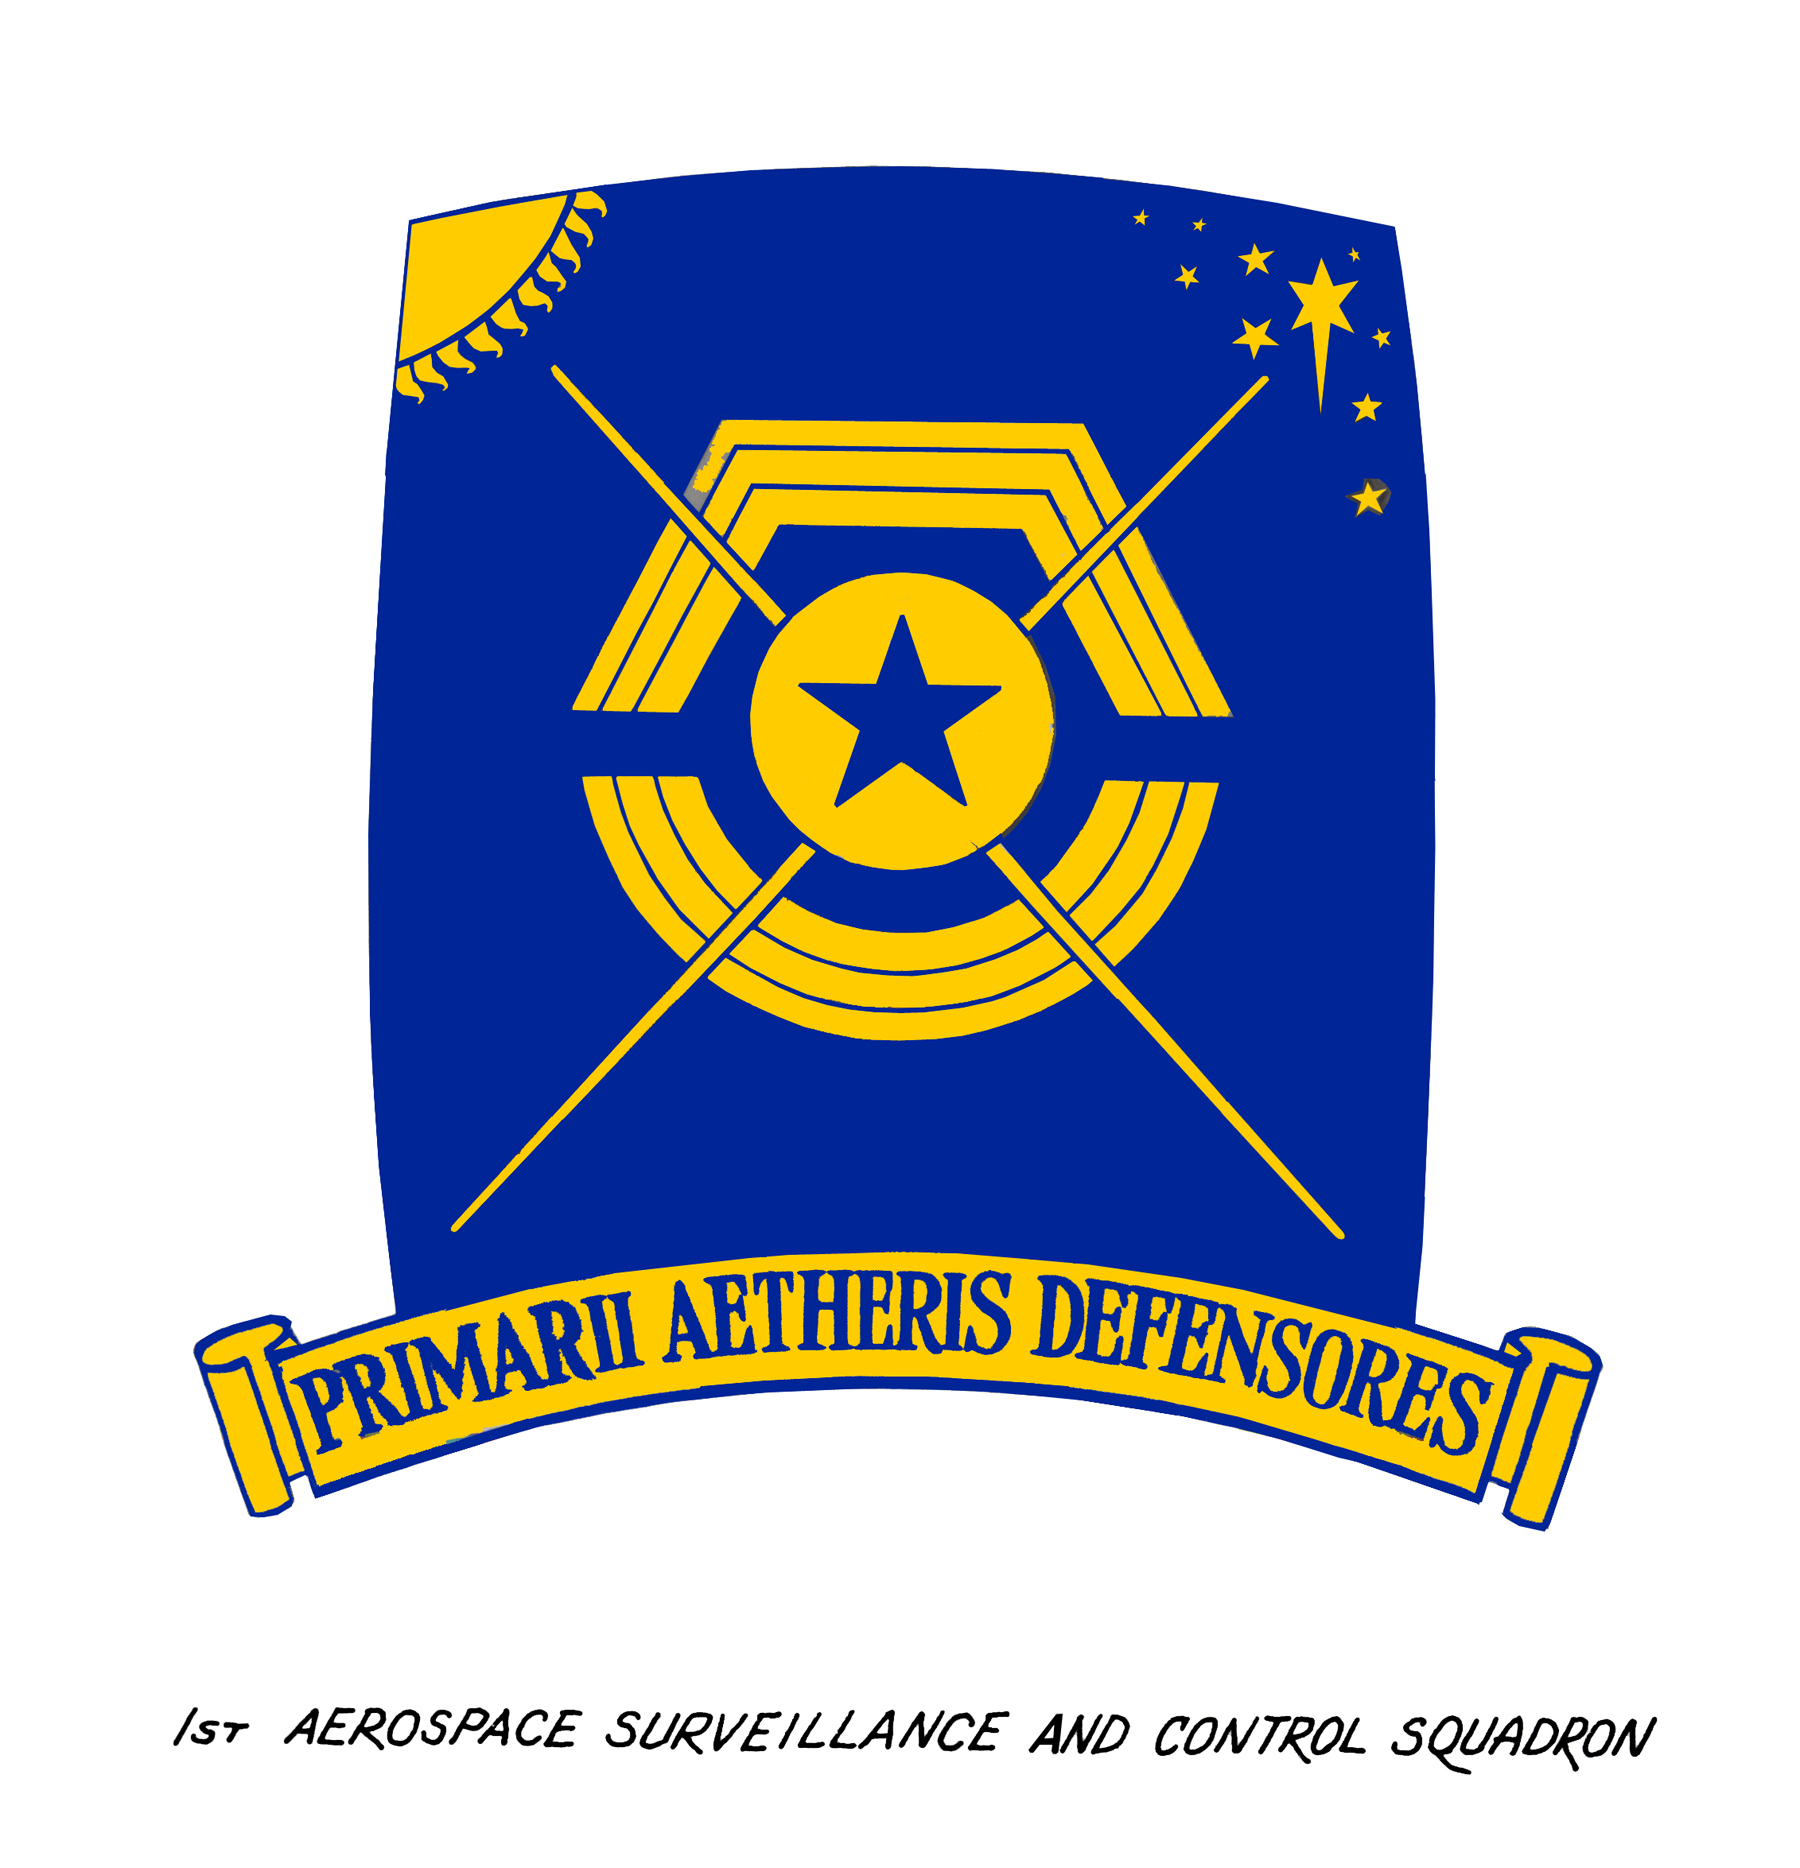 File:Emblem of the 1st Aerospace Sureveillance and Control